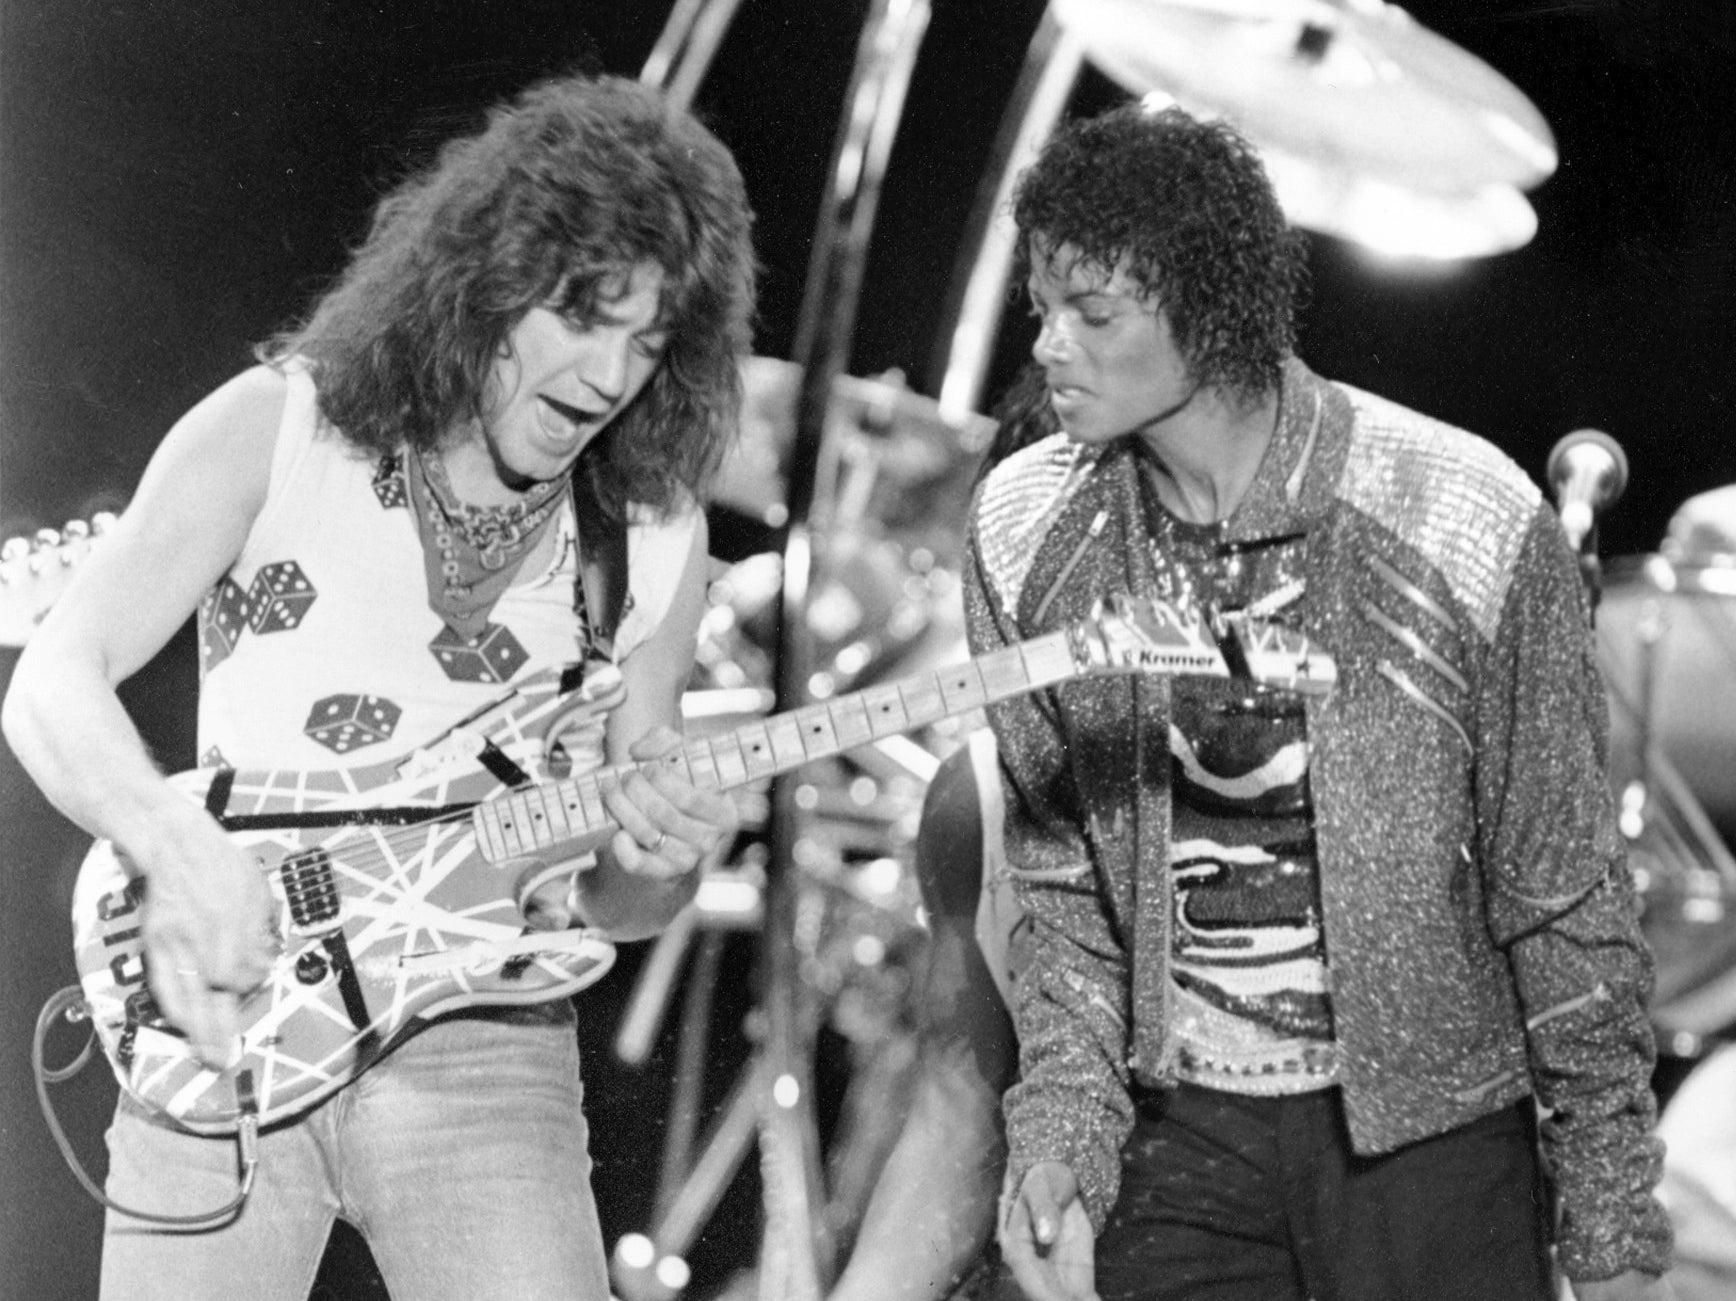 How Eddie Van Halen made Beat It a hit behind Michael Jackson's back